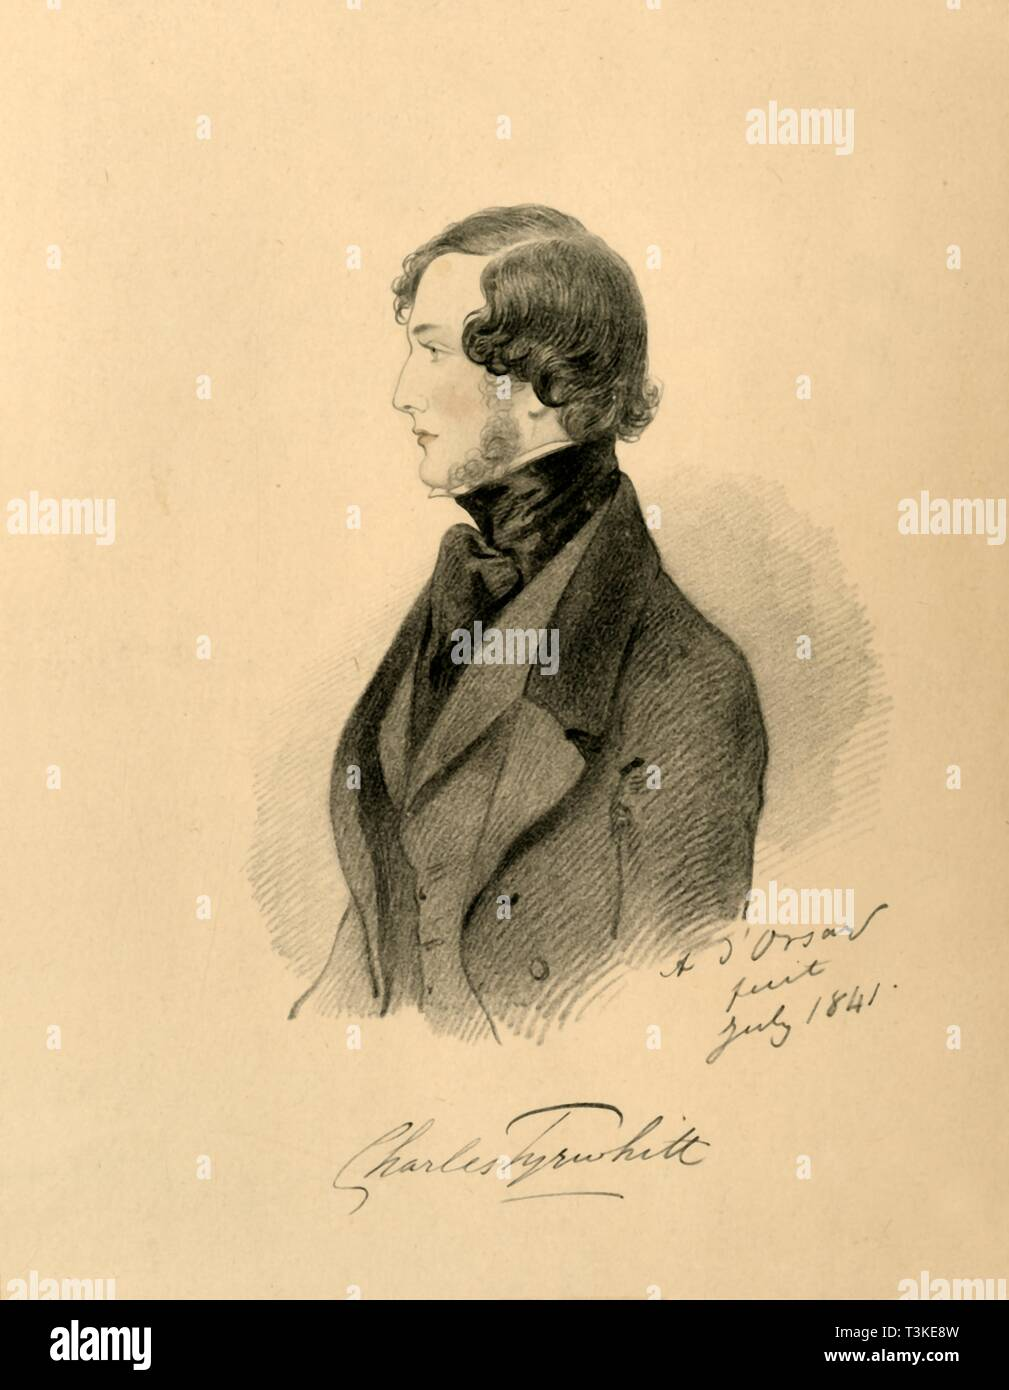 'Charles Tyrwhitt', 1841. Creator: Richard James Lane. - Stock Image